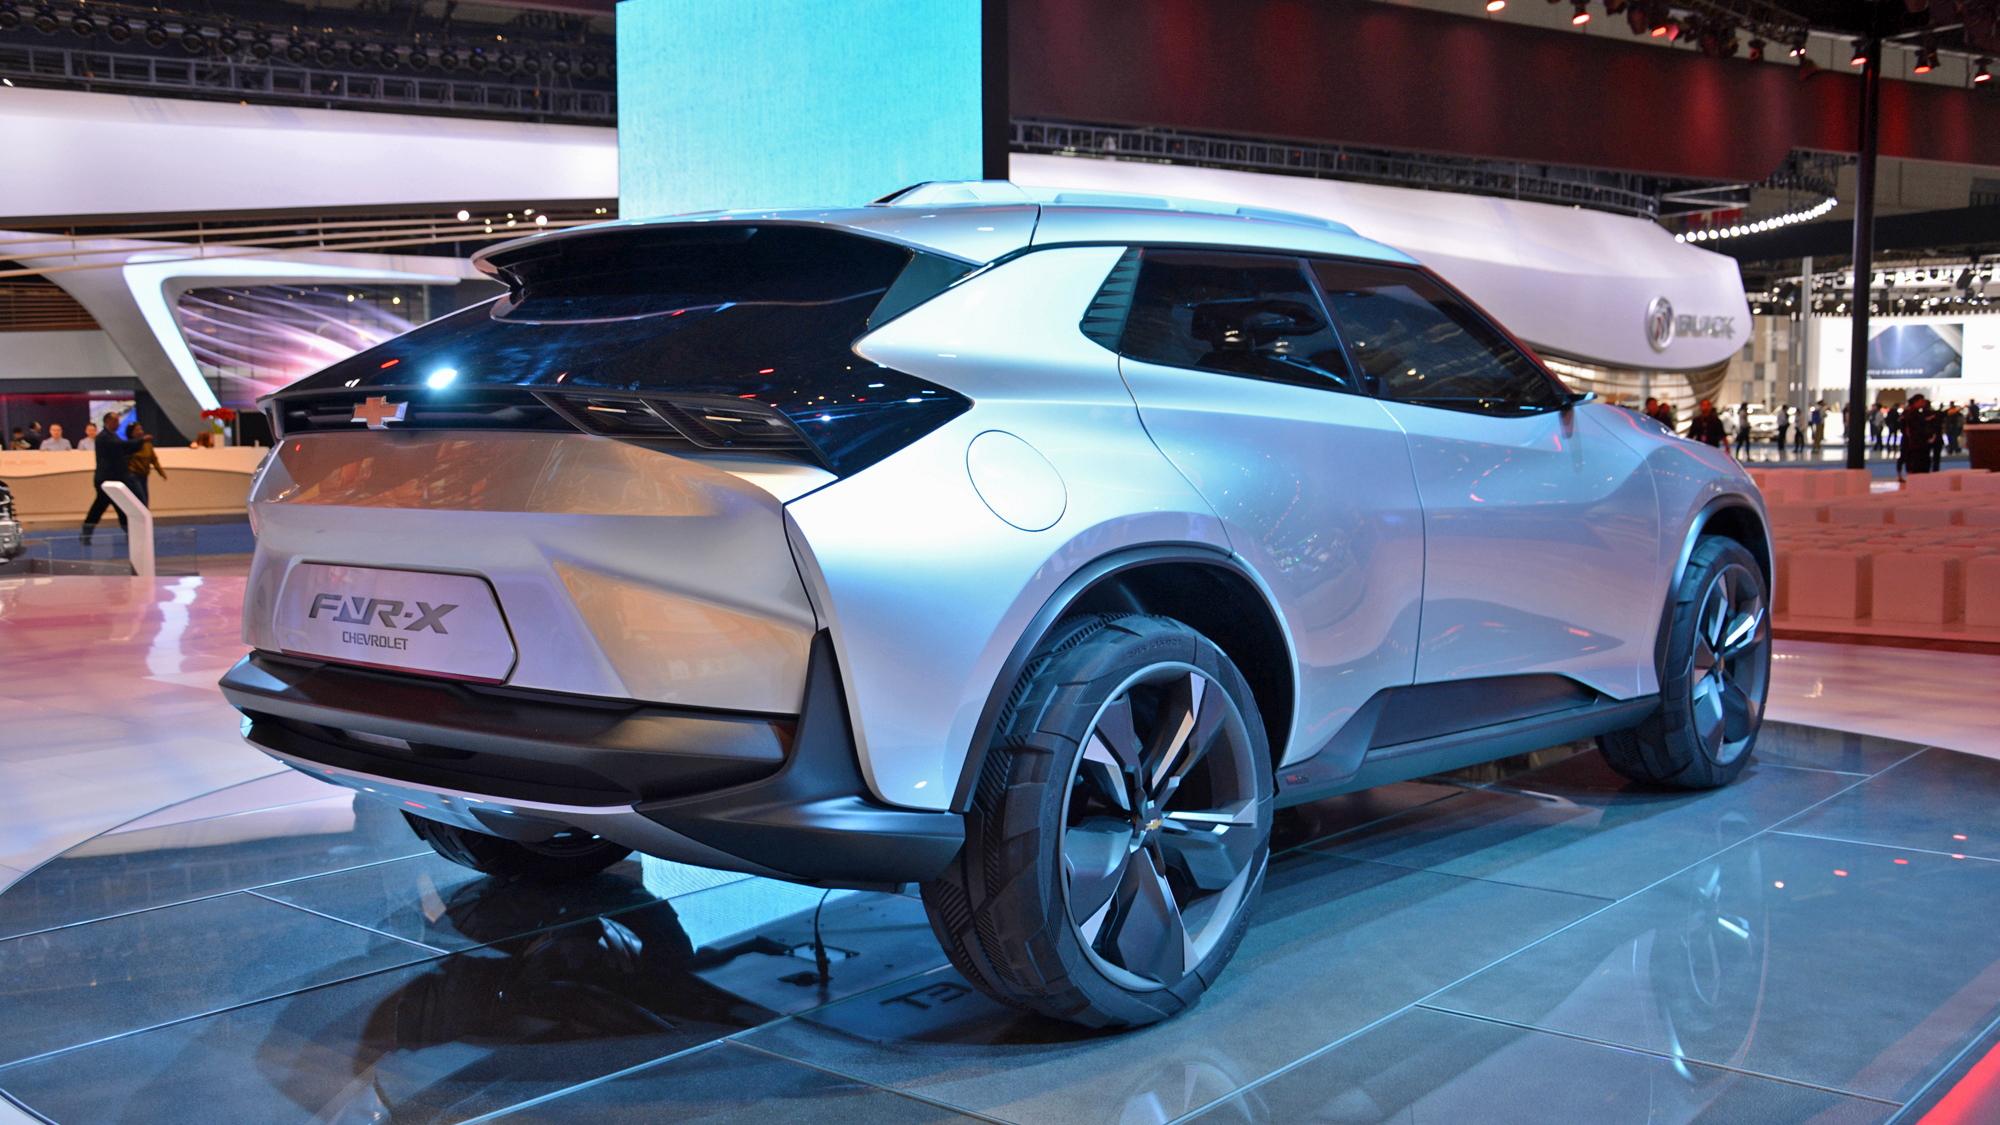 Chevrolet FNR-X Concept for plug-in hybrid crossover, 2017 Shanghai auto show   [photo: Ronan Glon]